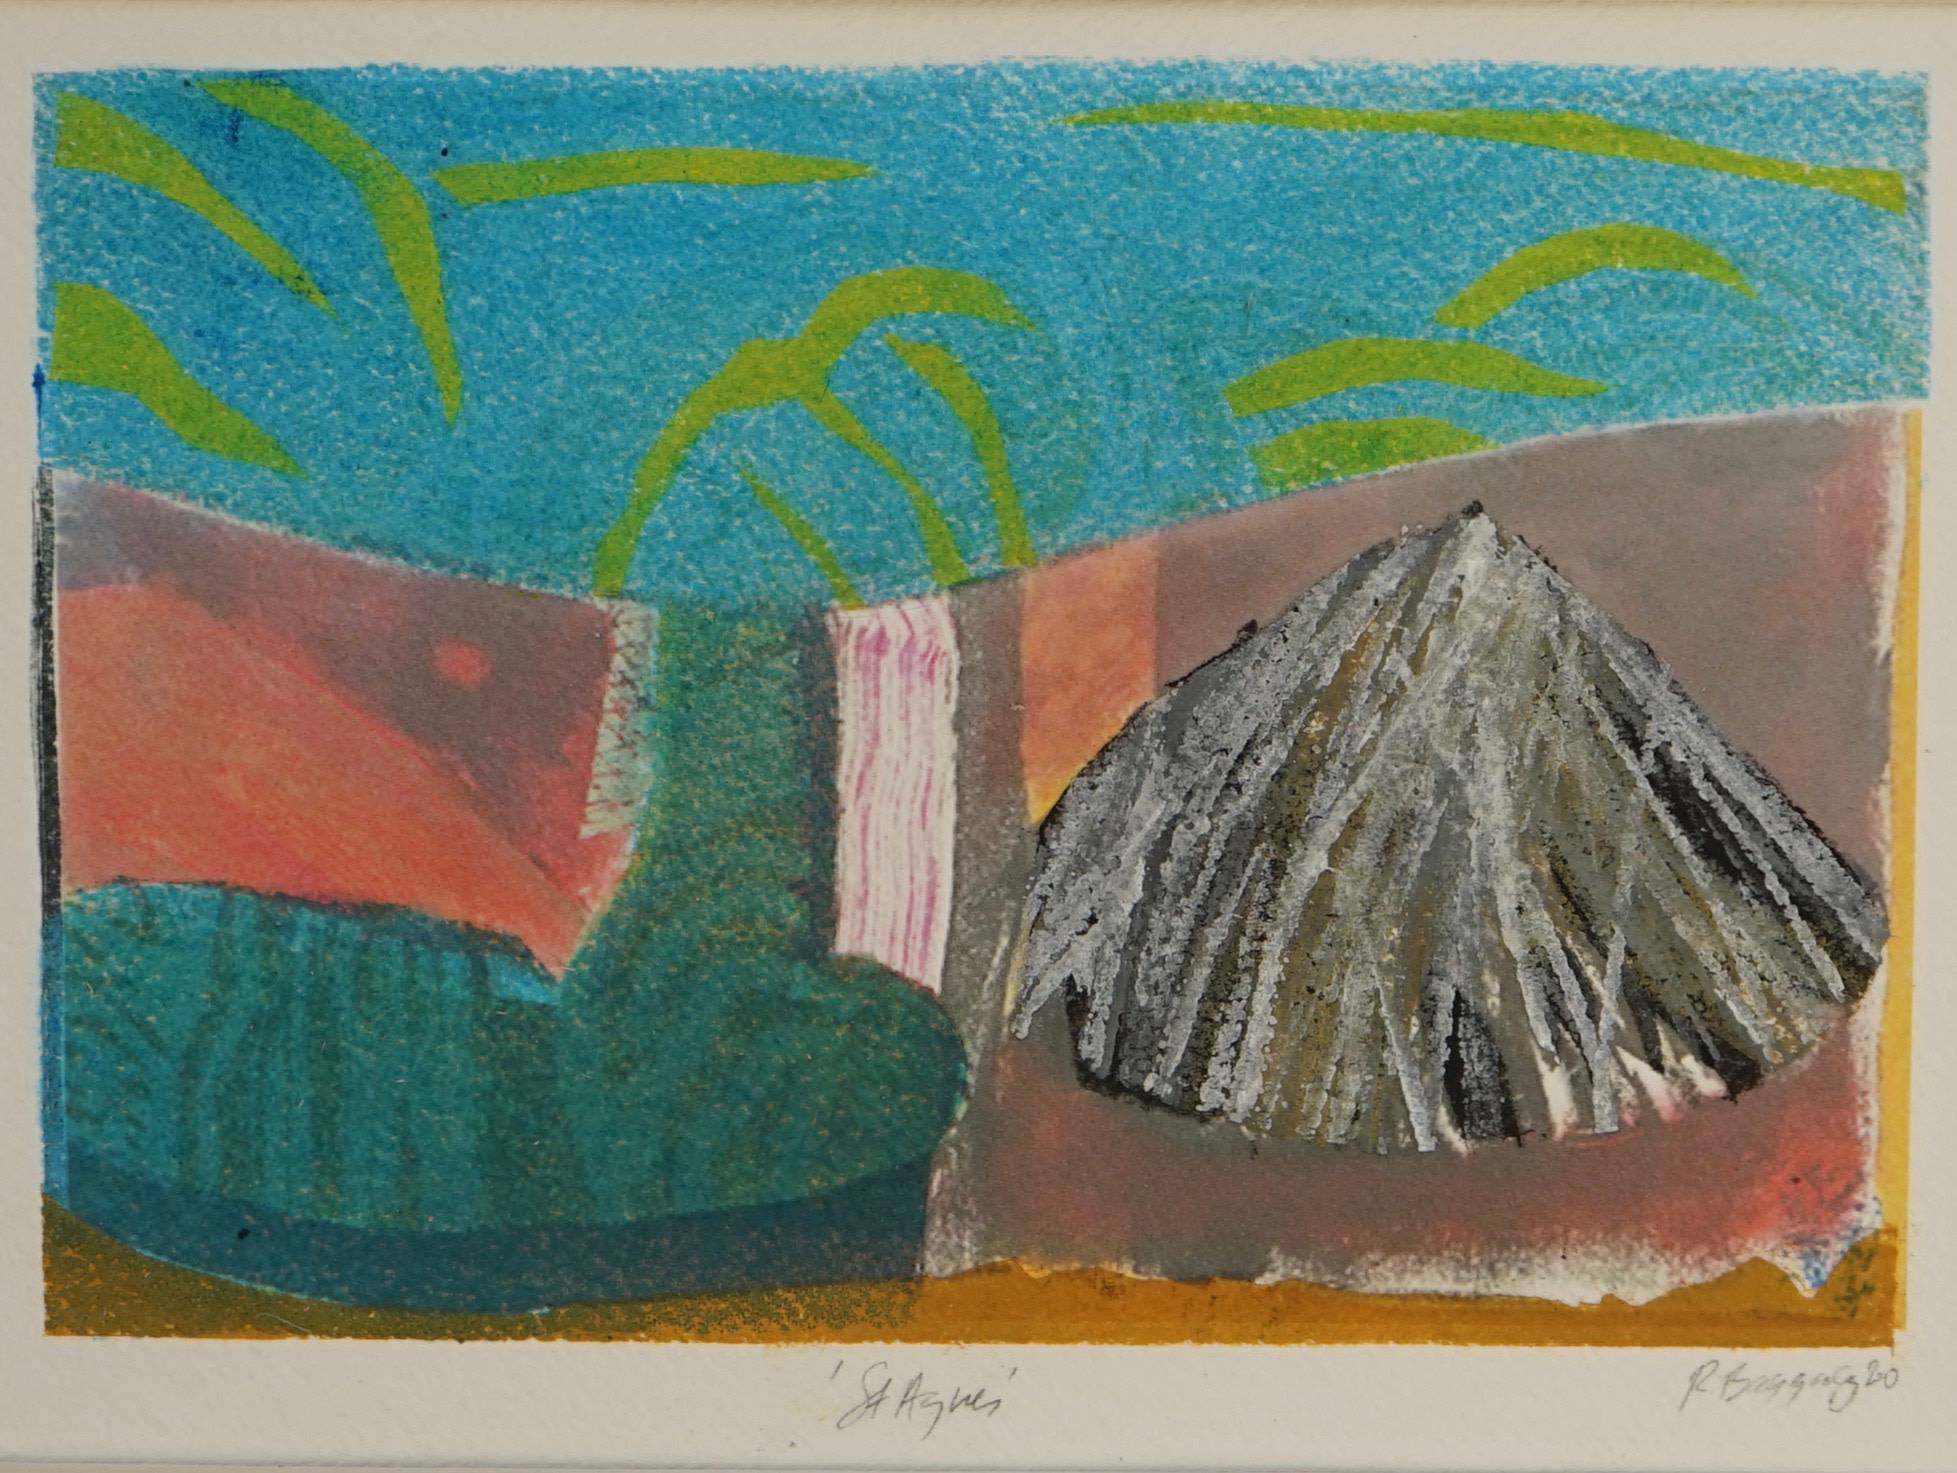 "<span class=""link fancybox-details-link""><a href=""/exhibitions/21/works/artworks_standalone11019/"">View Detail Page</a></span><div class=""artist""><span class=""artist""><strong>Robert Baggaley RE</strong></span></div><div class=""title""><em>St Agnes 2</em></div><div class=""medium"">monoprint</div><div class=""dimensions"">32 x 38 cm framed<br>12 x 18 cm image size</div><div class=""edition_details"">unique</div>"